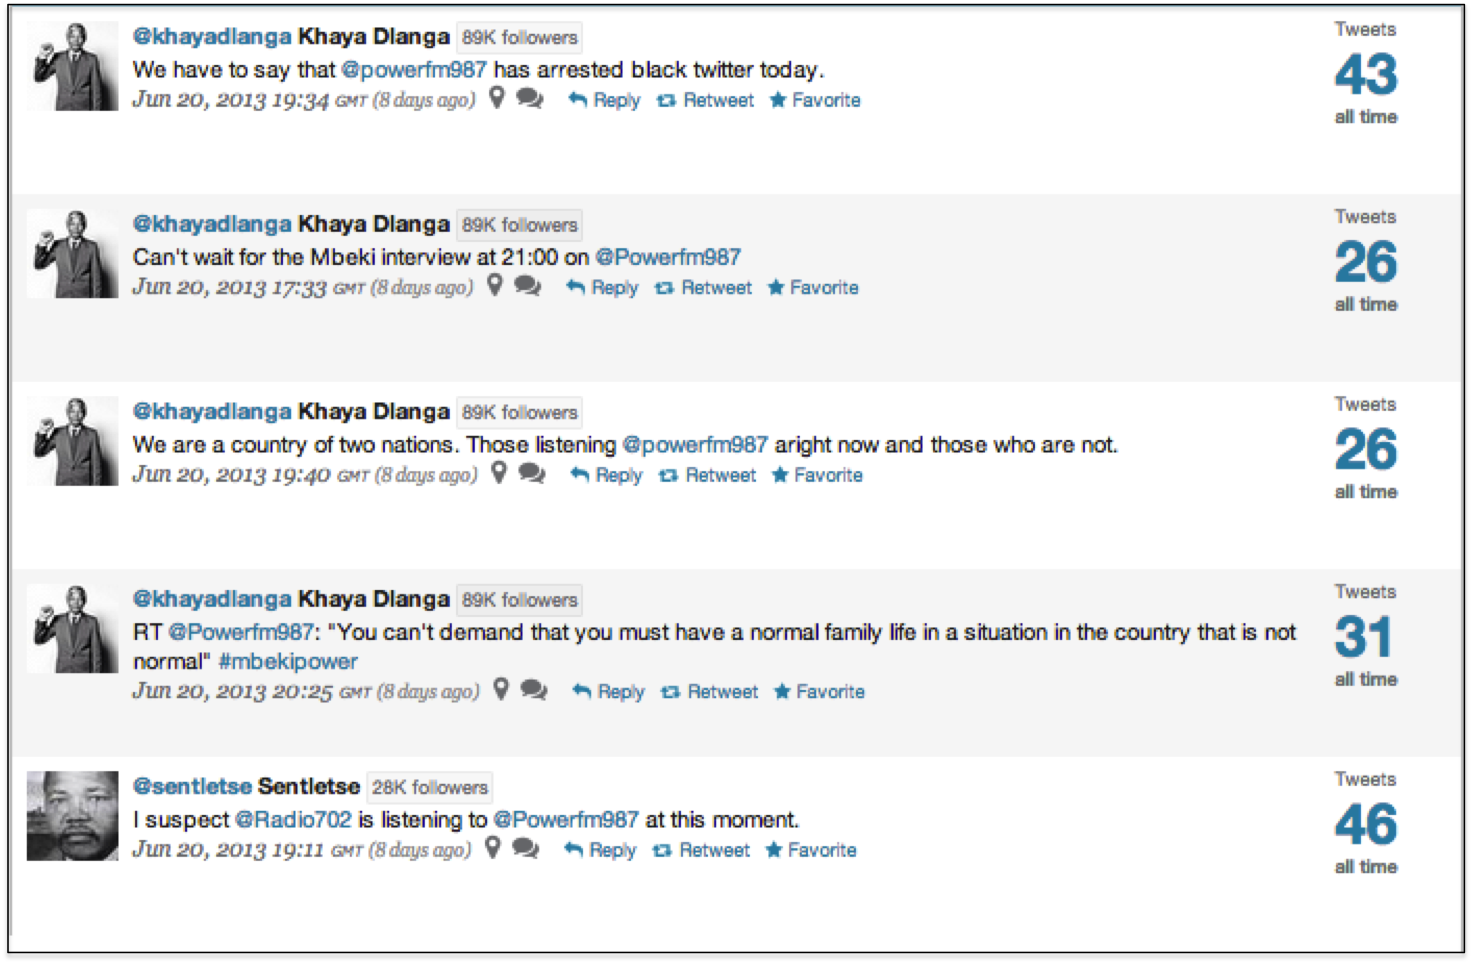 "<img src=http://""?w=504&h=330#MbekiPower_Top_ Tweets.png"" alt=""#MbekiPower Top Tweets"">"